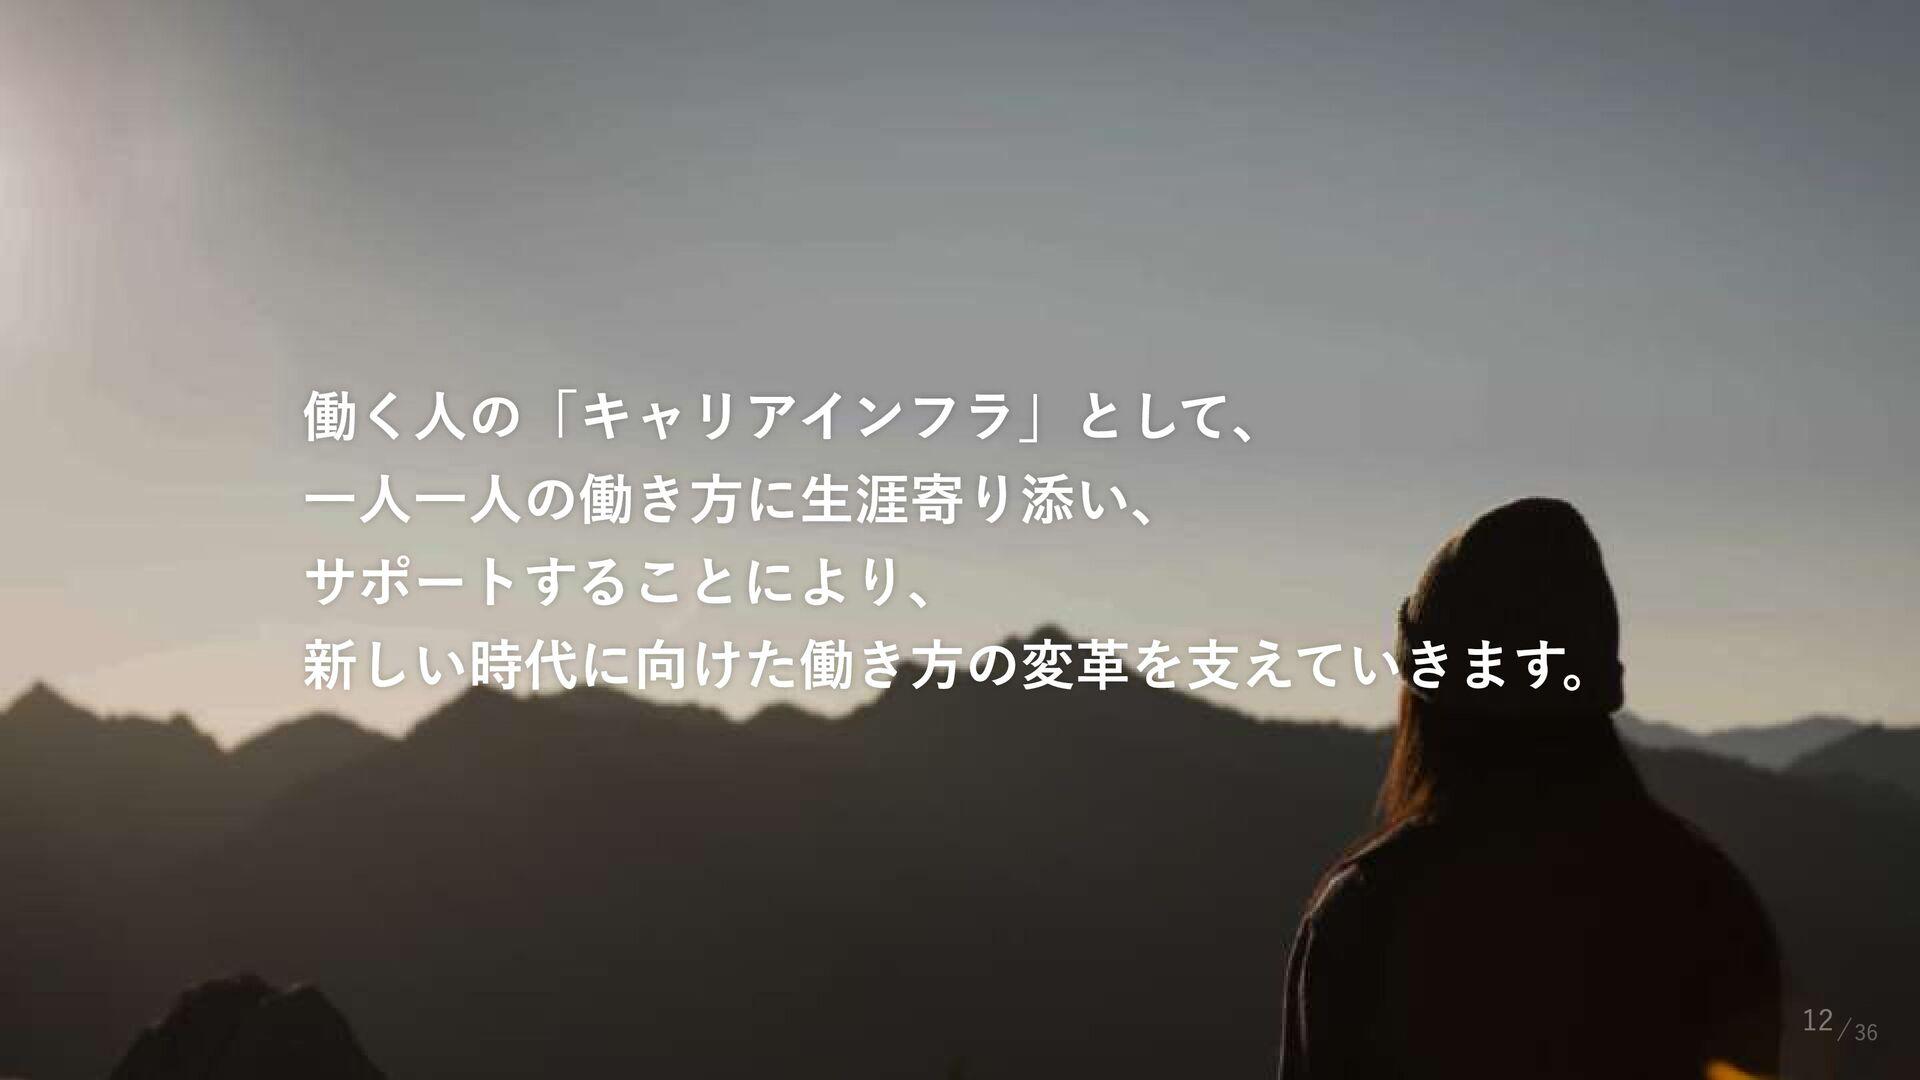 12 VISIONAL DESIGN Philosophy